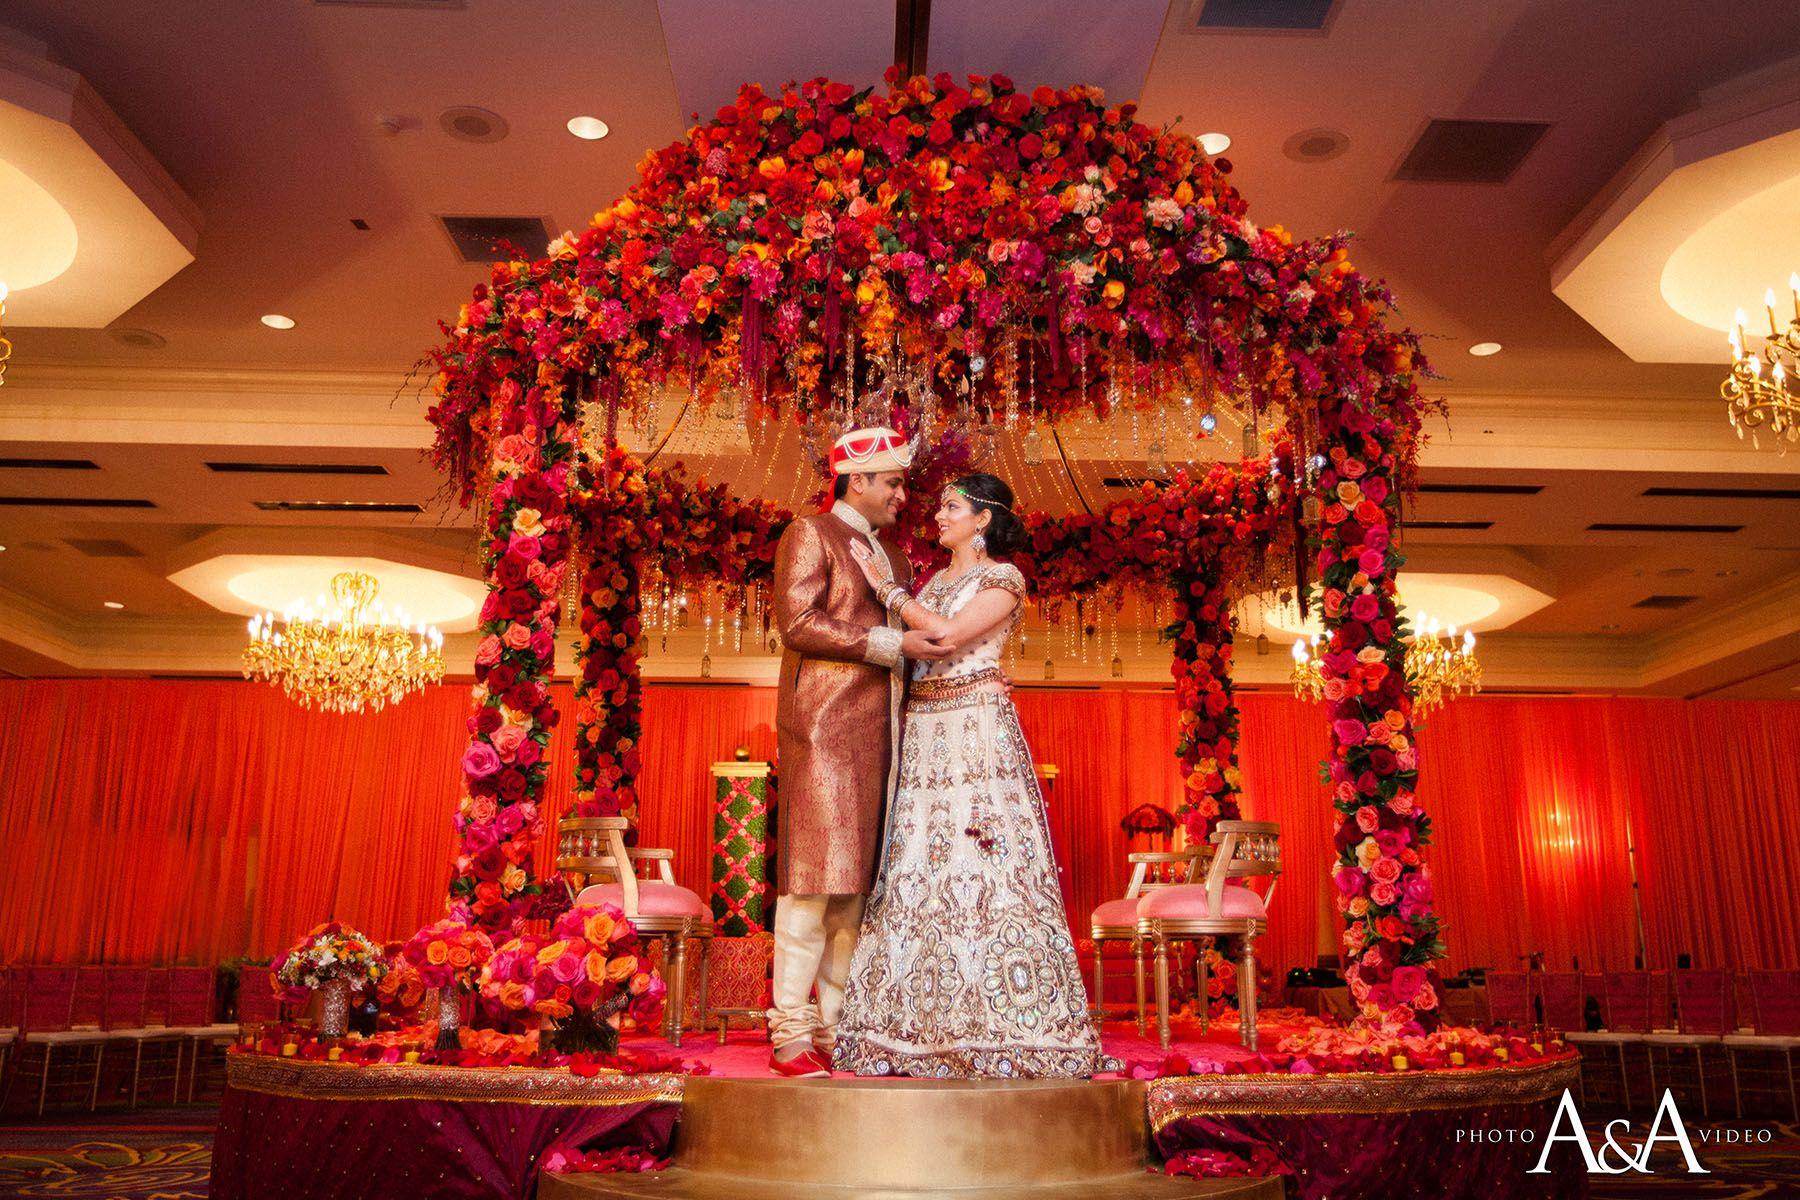 Prashe decor is a wedding design company specializing in floral prashe decor is a wedding design company specializing in floral design linen custom fabrication rental chairs and luxury furniture junglespirit Choice Image